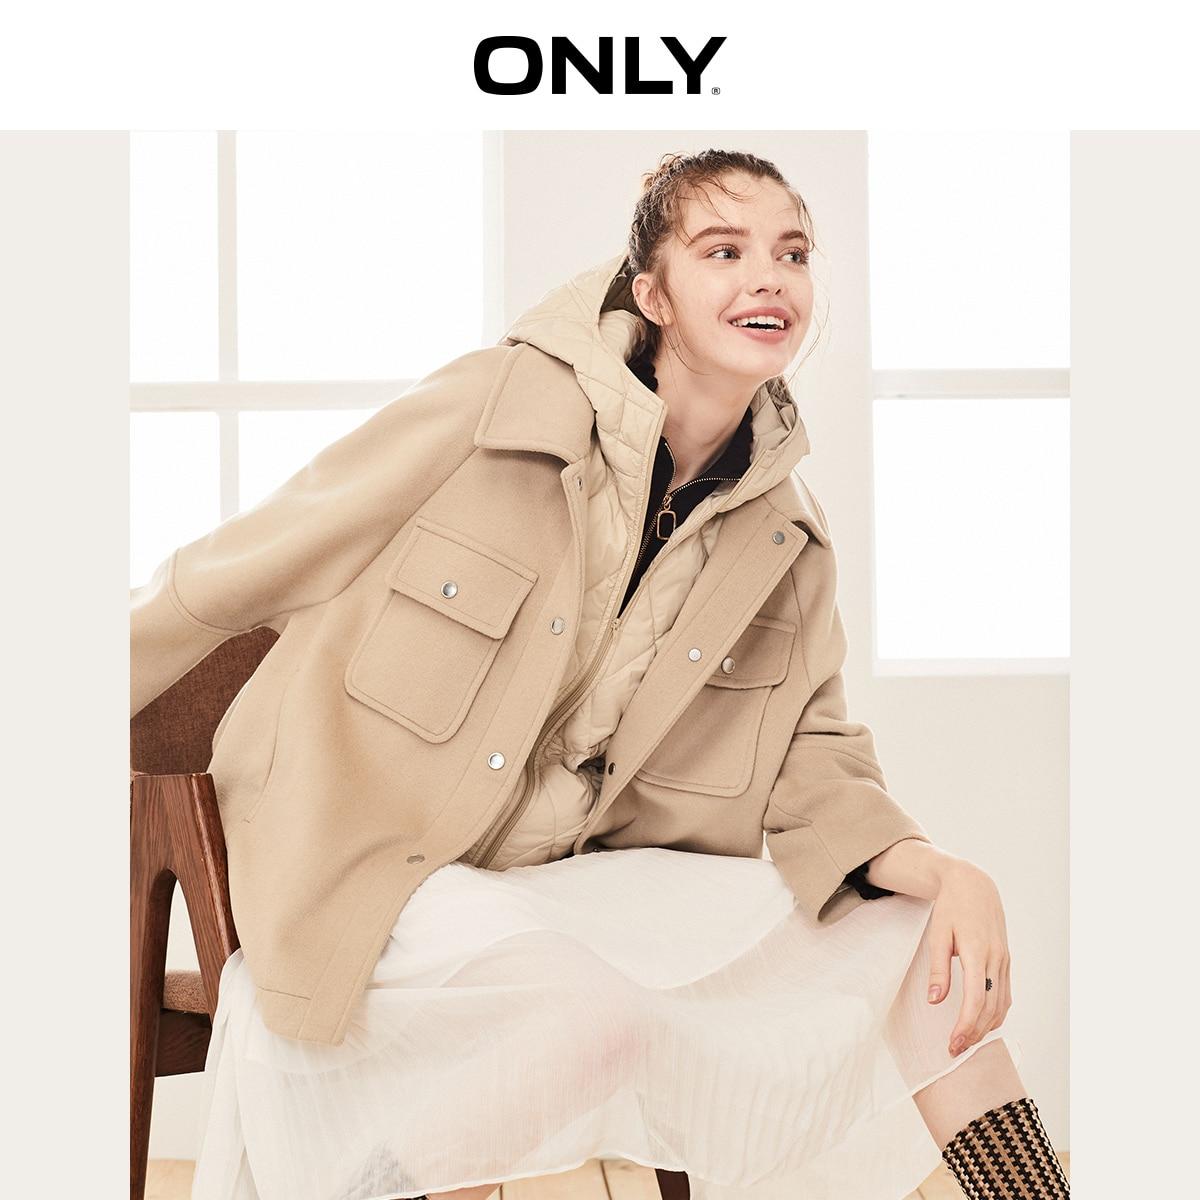 ONLY  Autumn Winter Women's Two-piece Woolen Coat | 11934T507